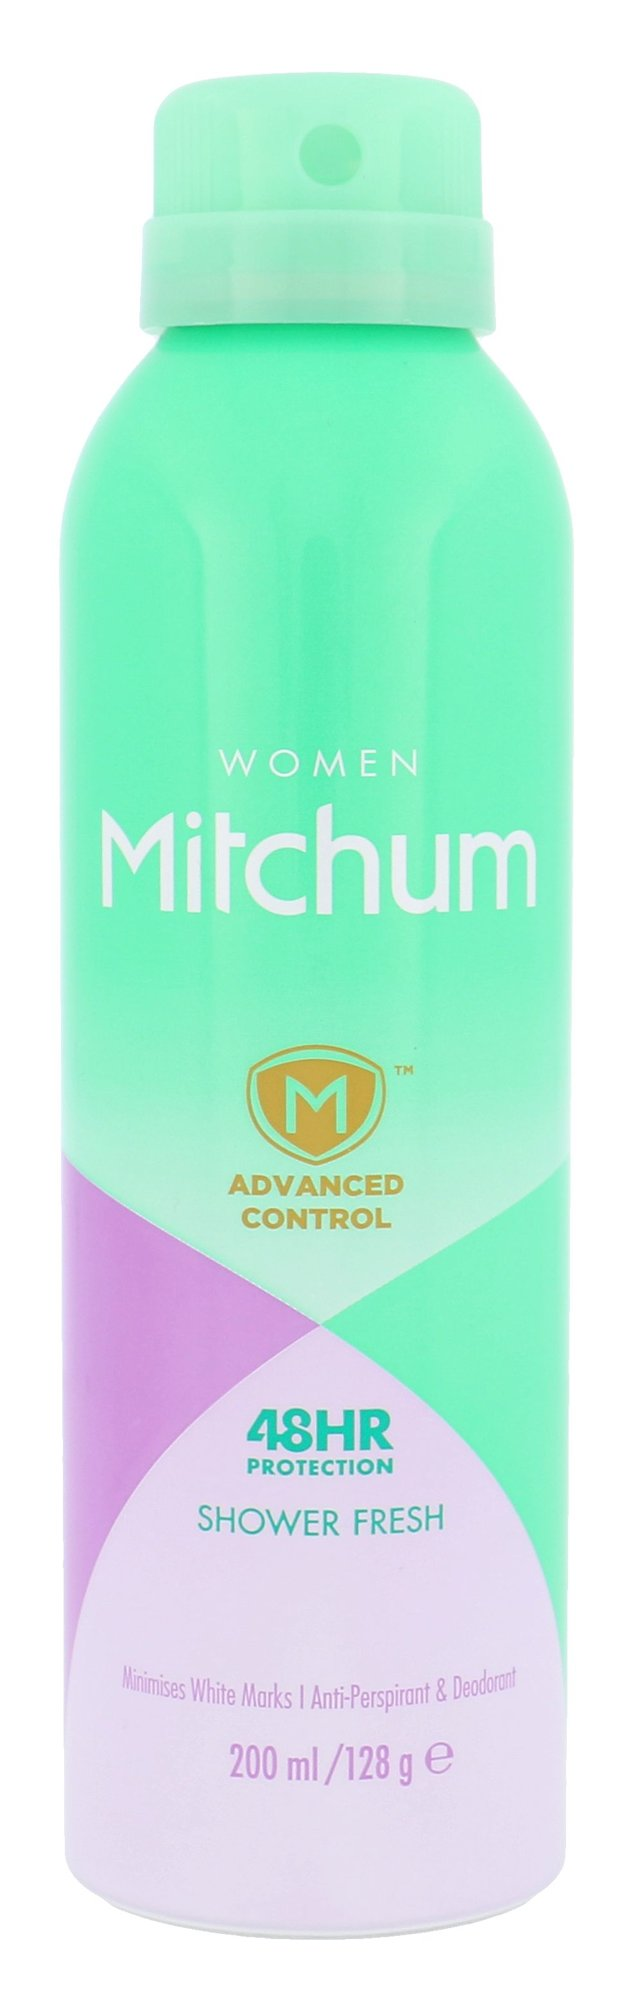 Mitchum Shower Fresh Anti-Perspirant Deo Spray 48HR Cosmetic 200ml